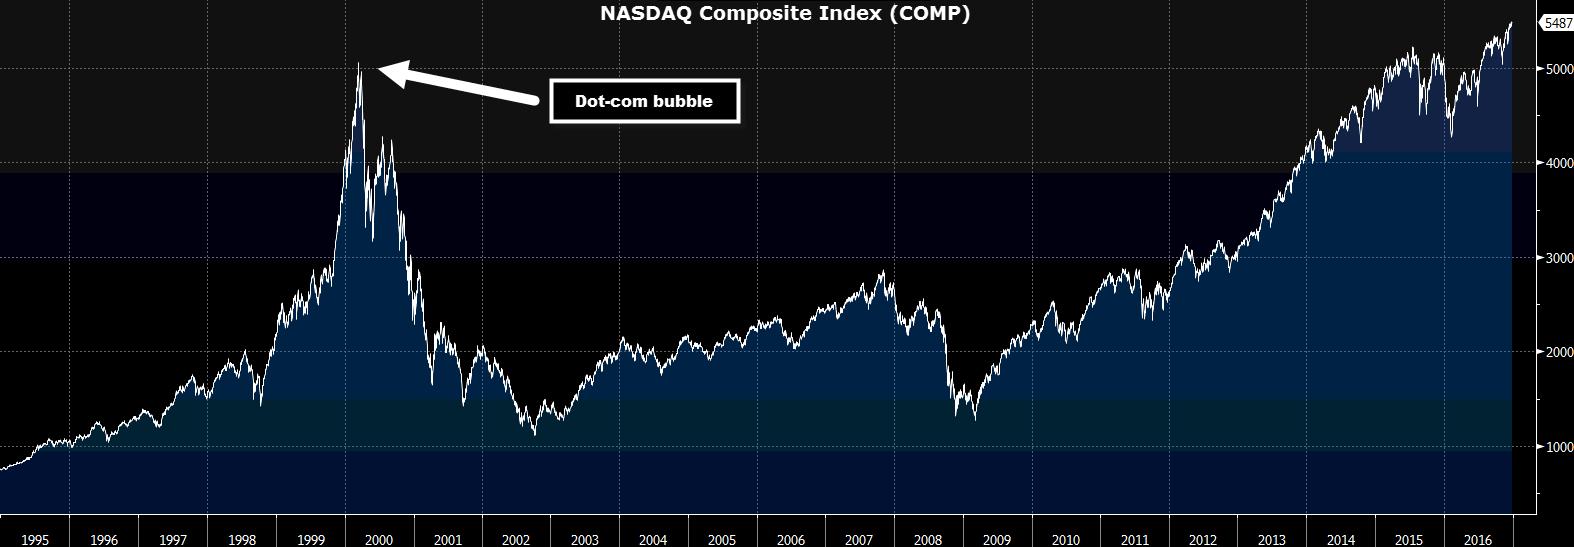 nasdaq-composite-index-koers-comp-visueel-grafiek-dot-com-bubble